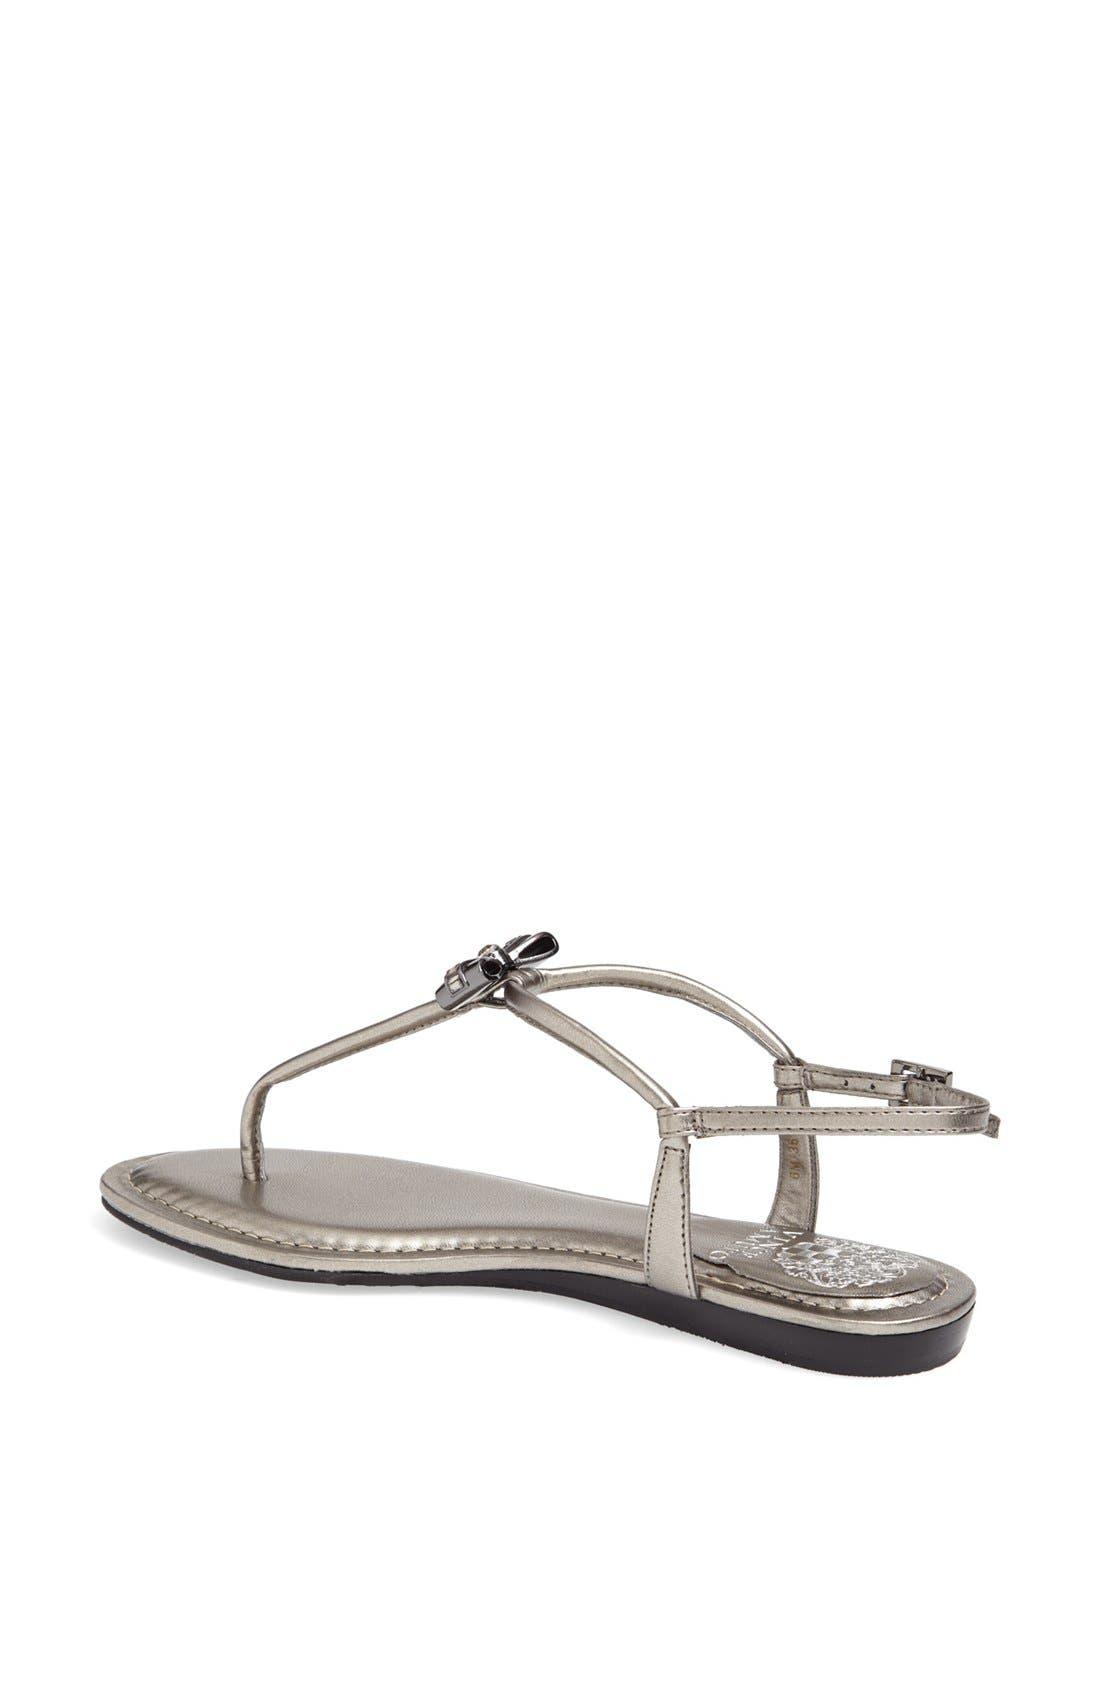 Alternate Image 2  - Vince Camuto 'Klaudio' Thong Sandal